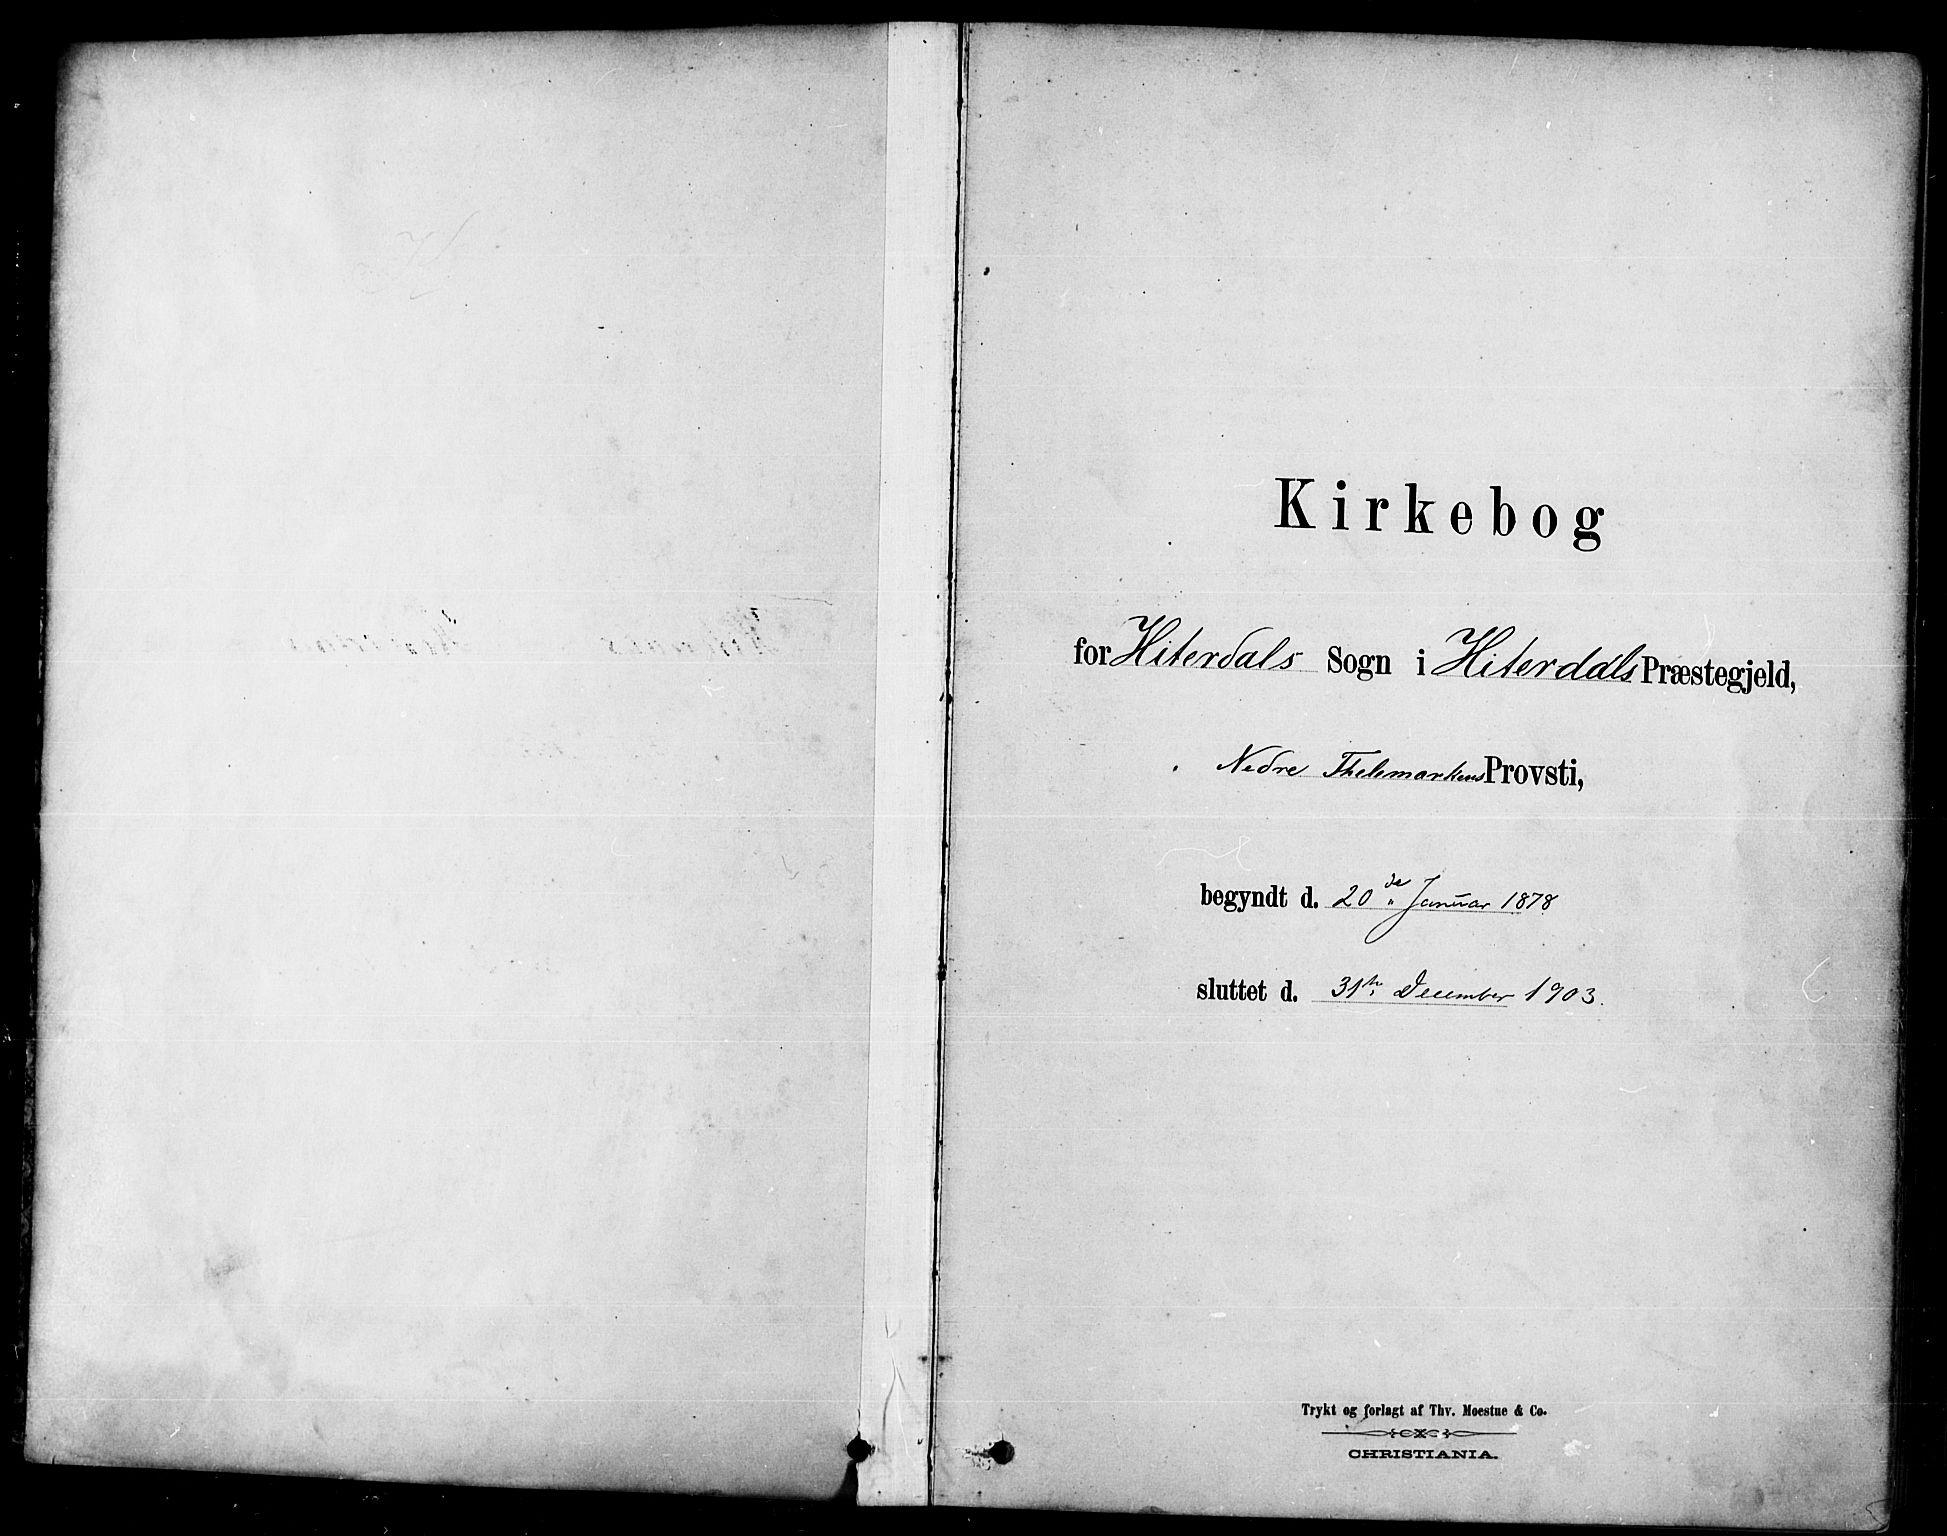 SAKO, Heddal kirkebøker, F/Fa/L0009: Ministerialbok nr. I 9, 1878-1903